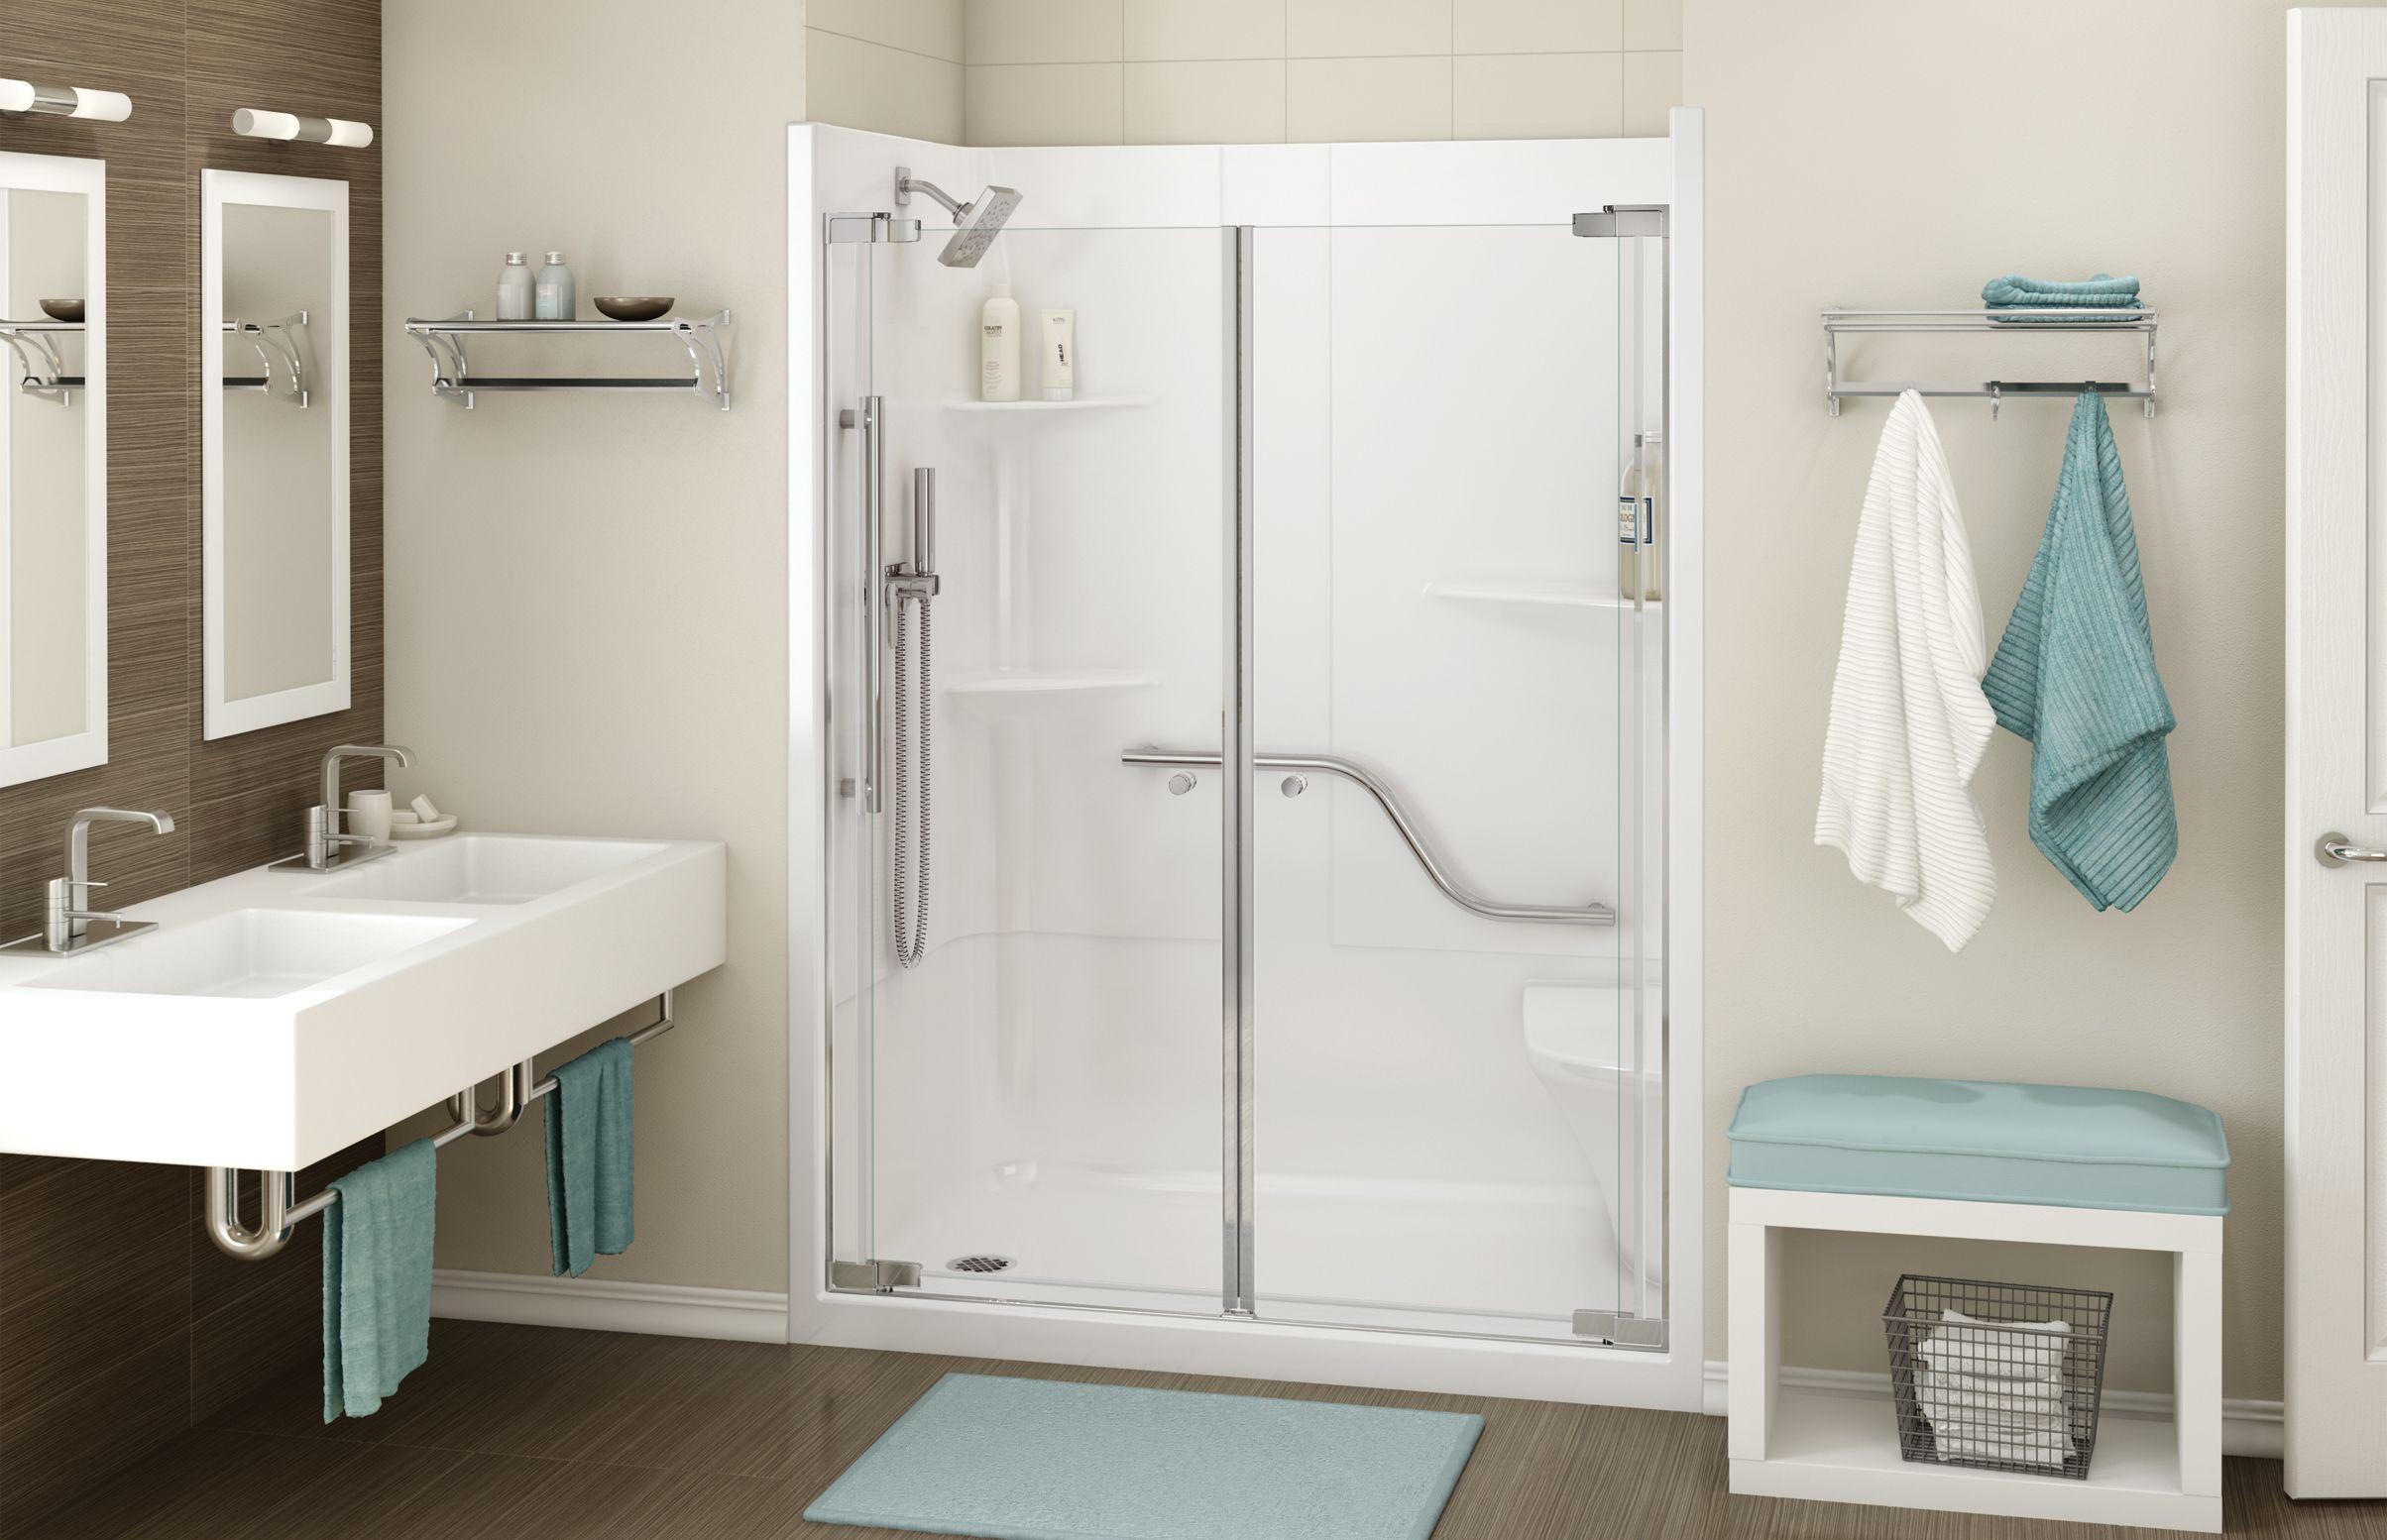 ALLIA SH-6034 Alcove Showers - MAAX Professional   B&C Bathroom ...